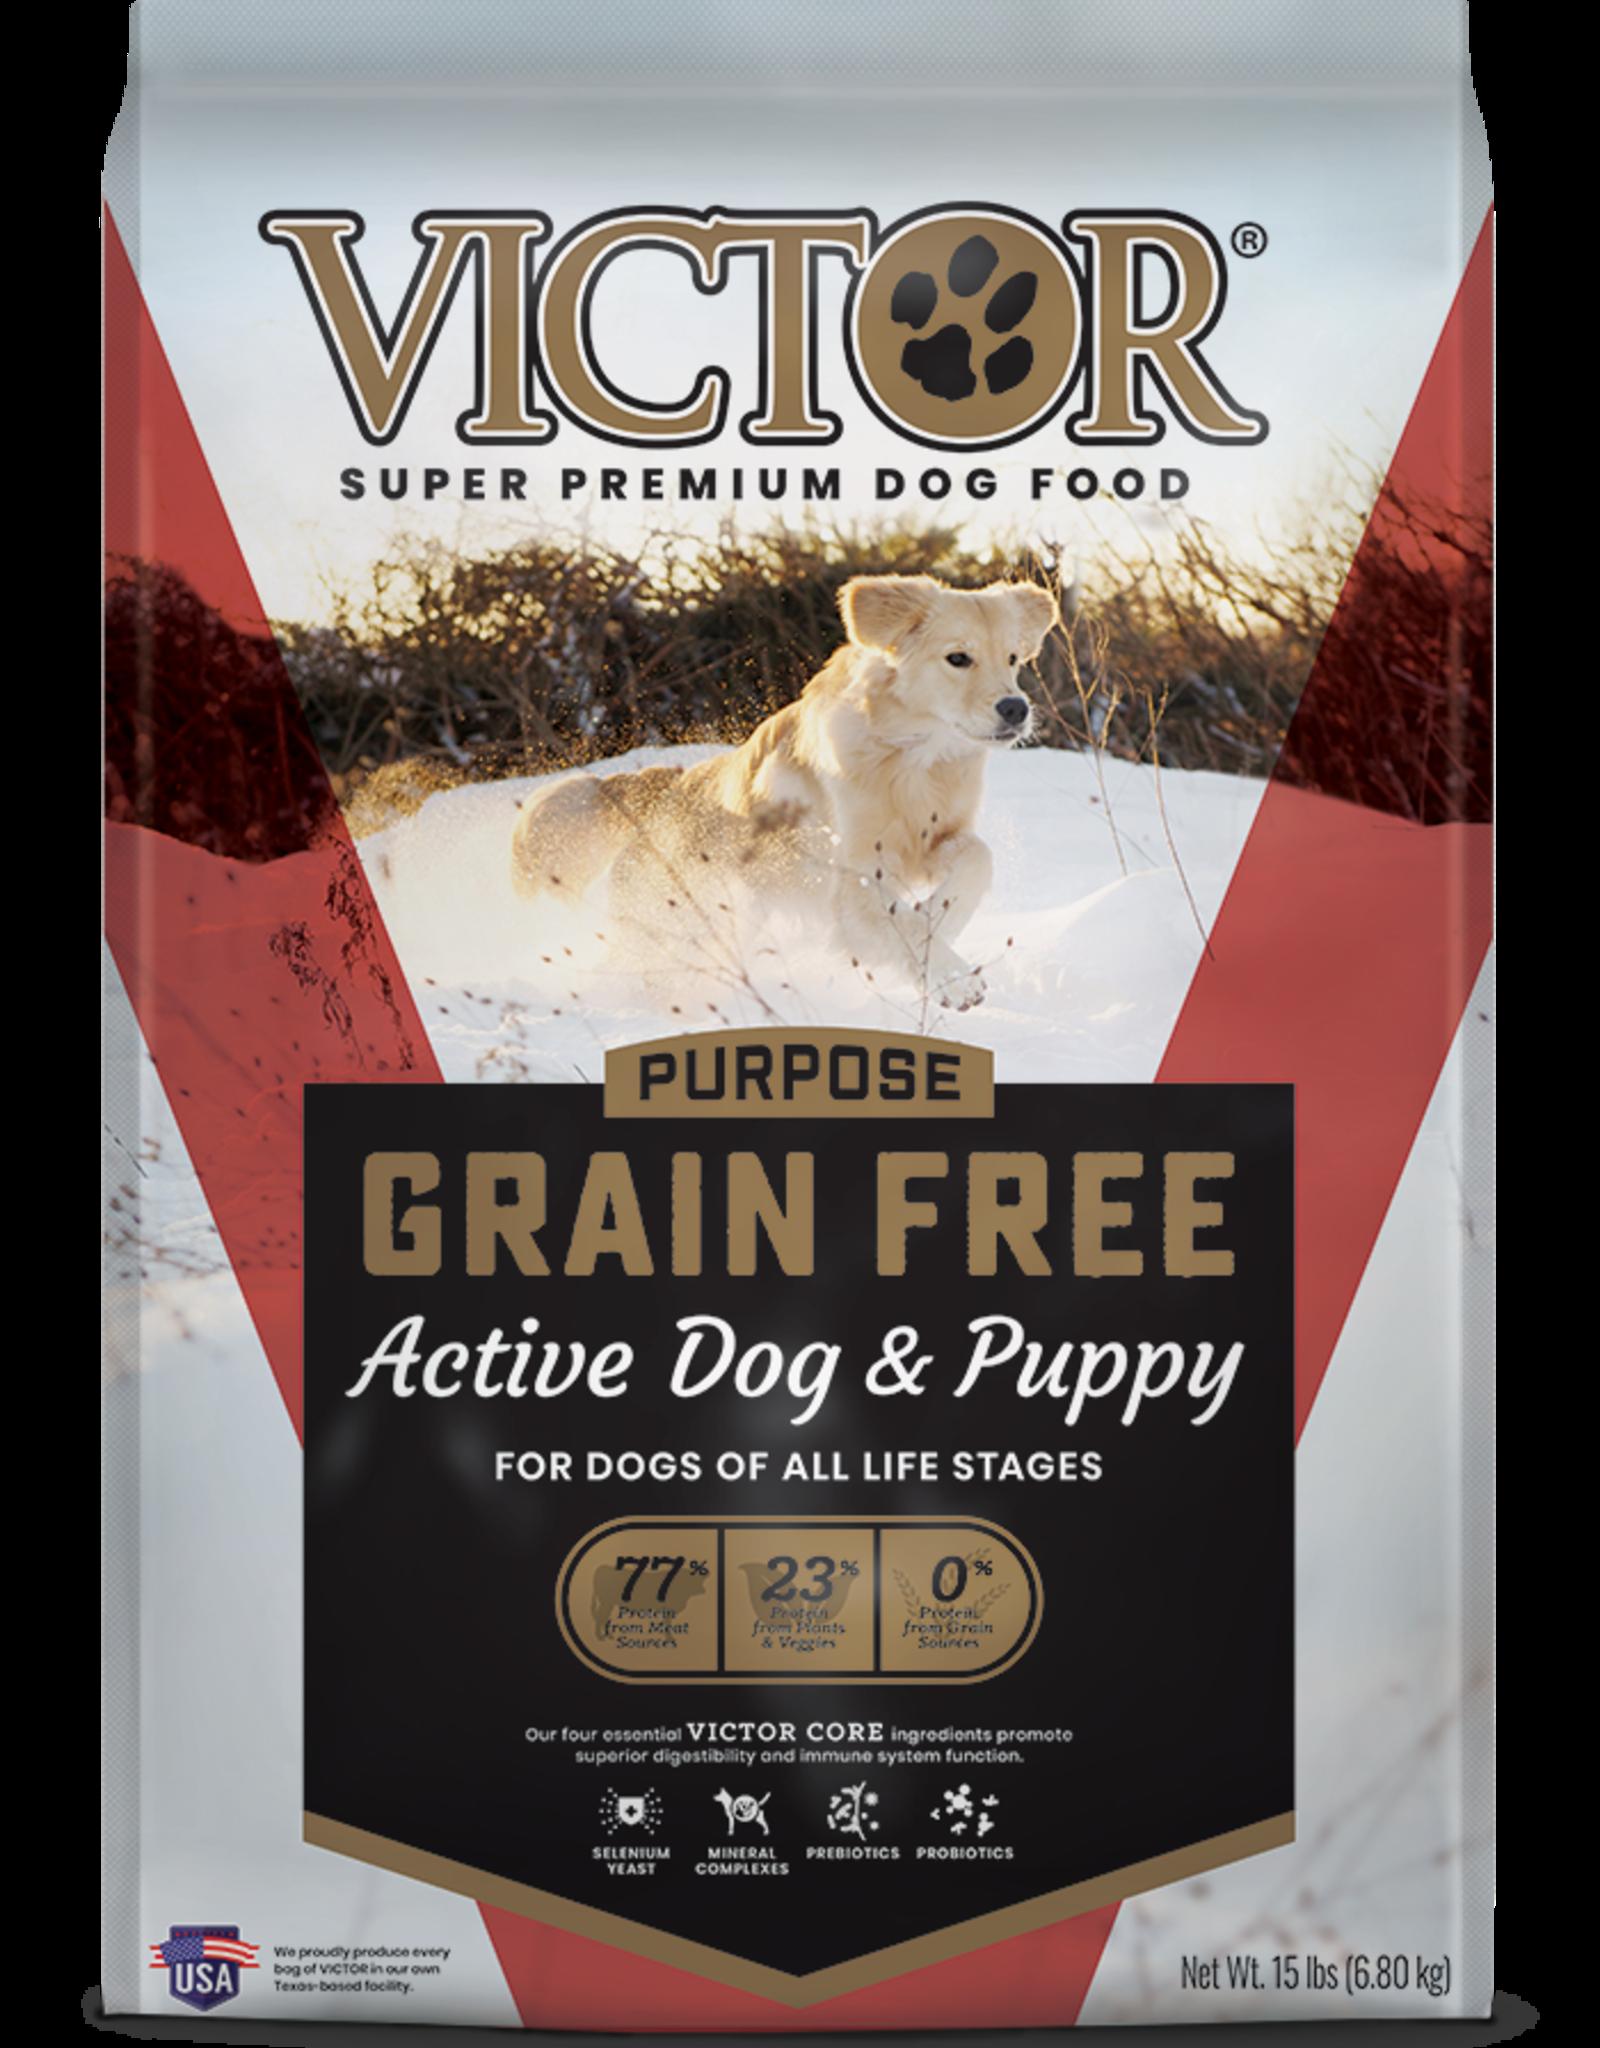 Victor Victor Grain Free Dog Food Active Dog & Puppy